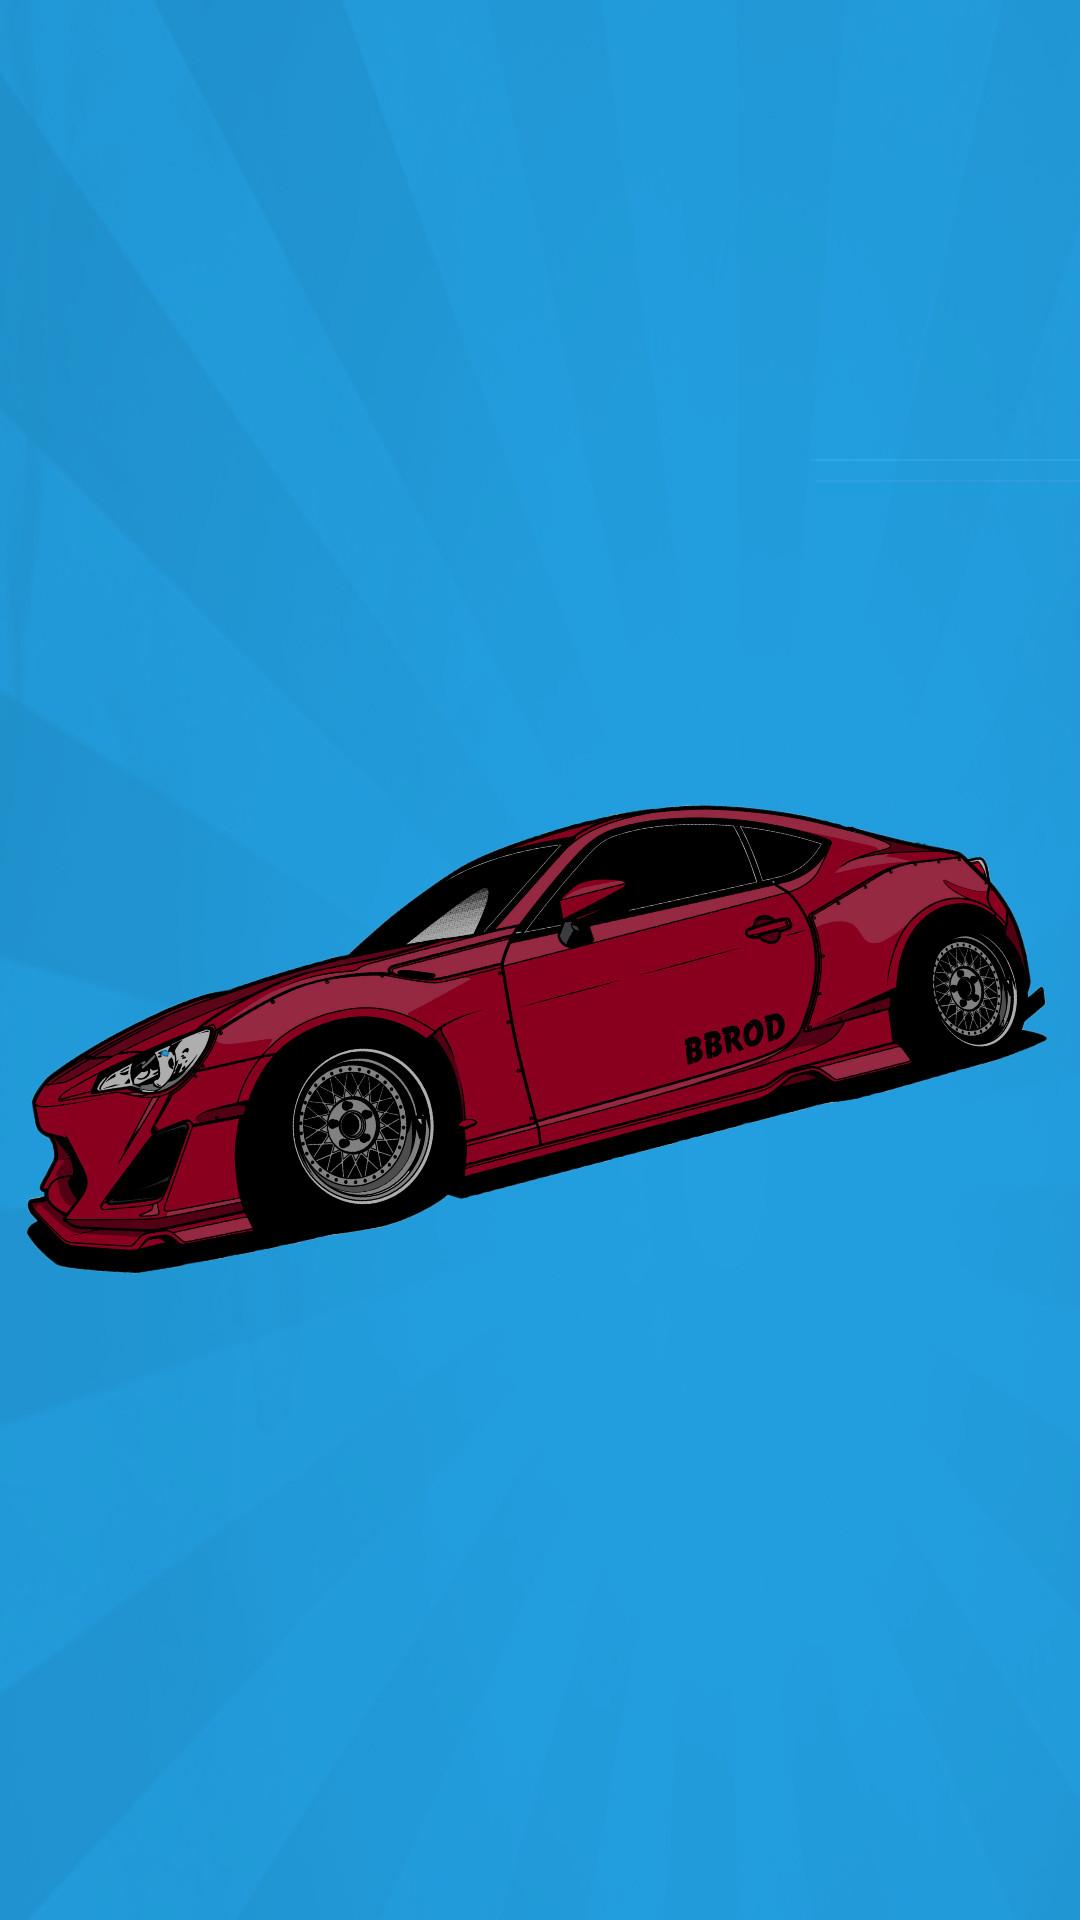 #jdm #nissan #drift #car #auto